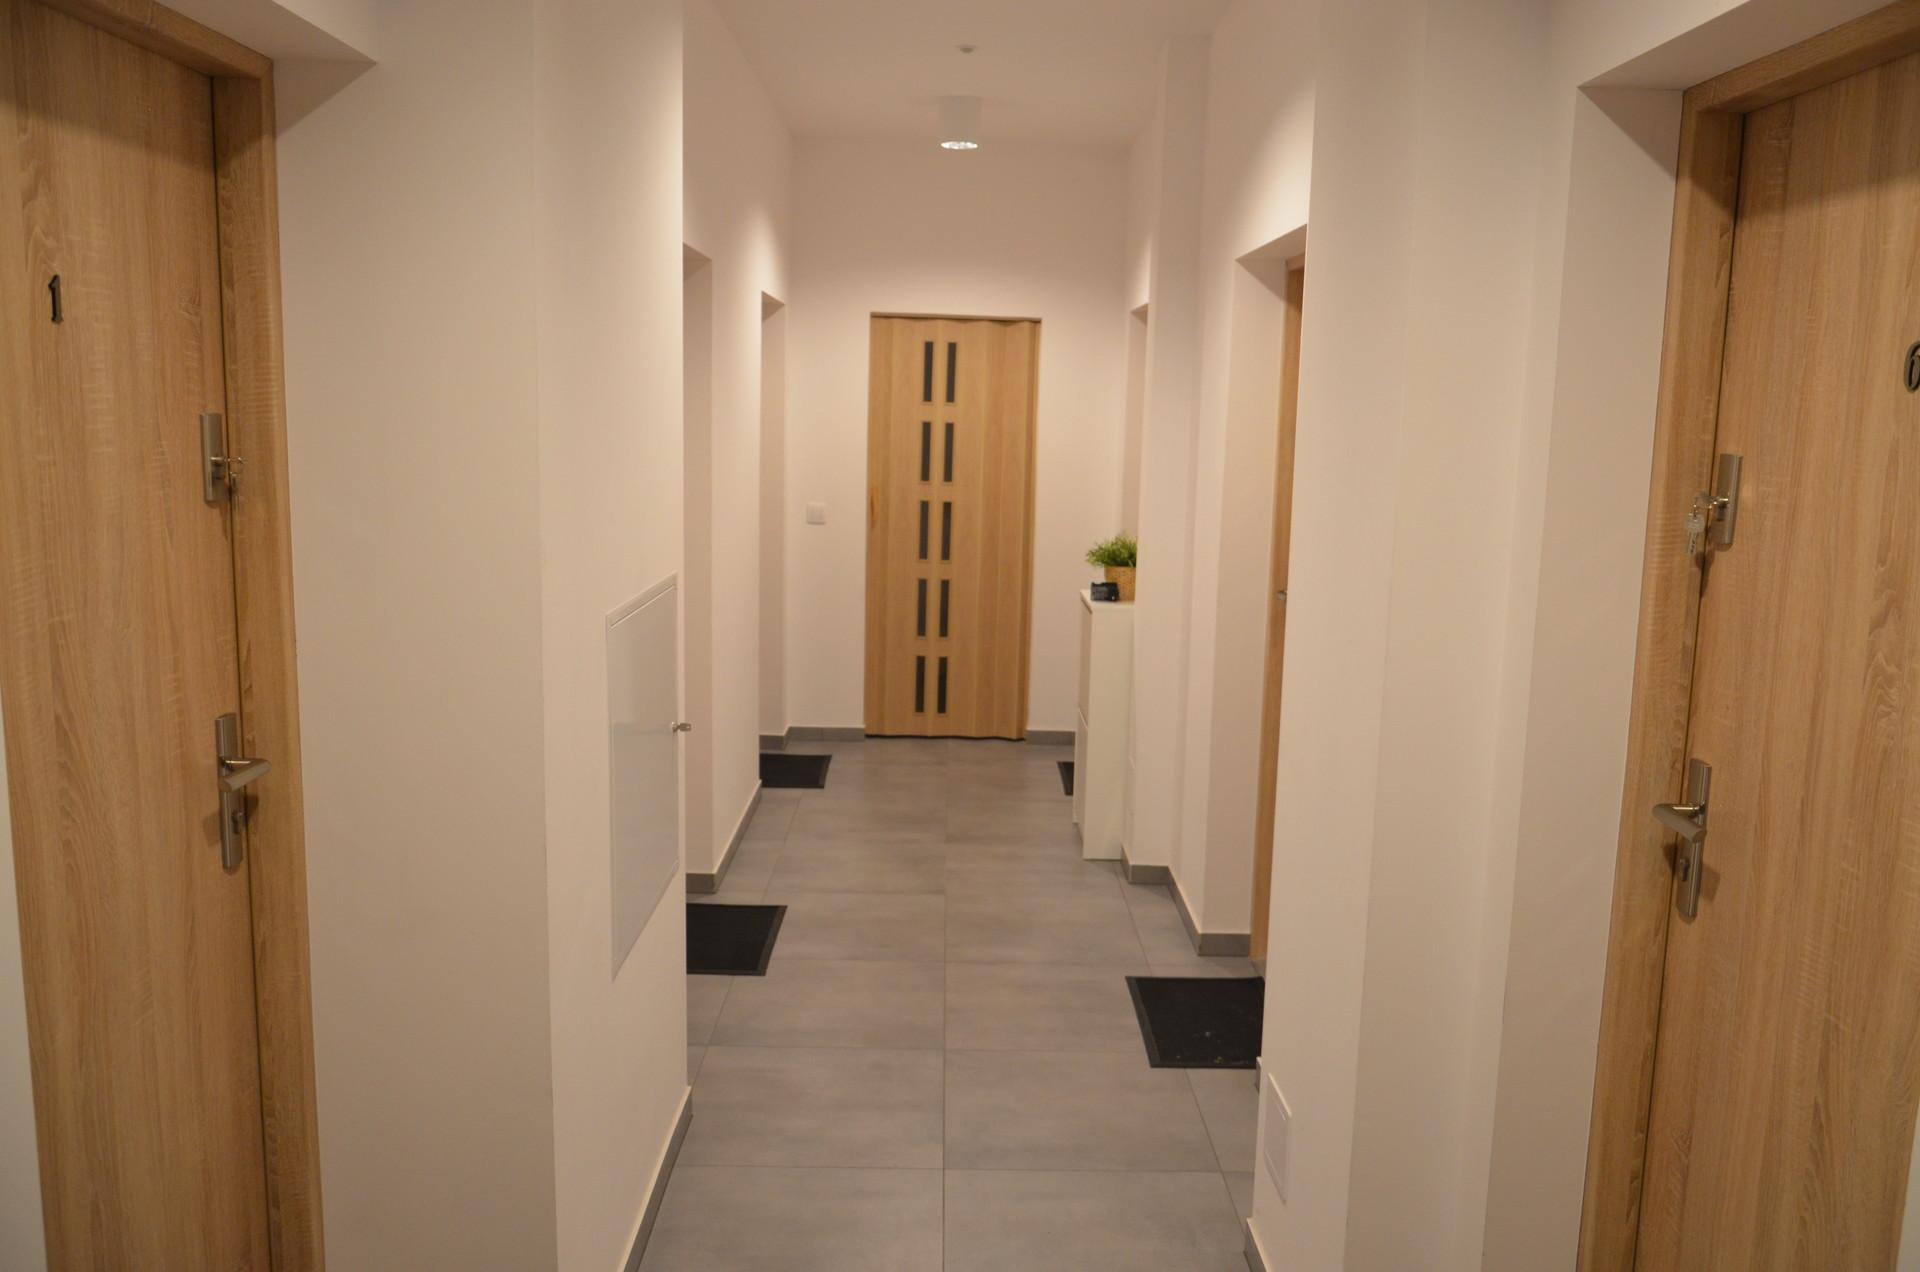 studio-rent-5743177158407fba2bfa56b308b90acf